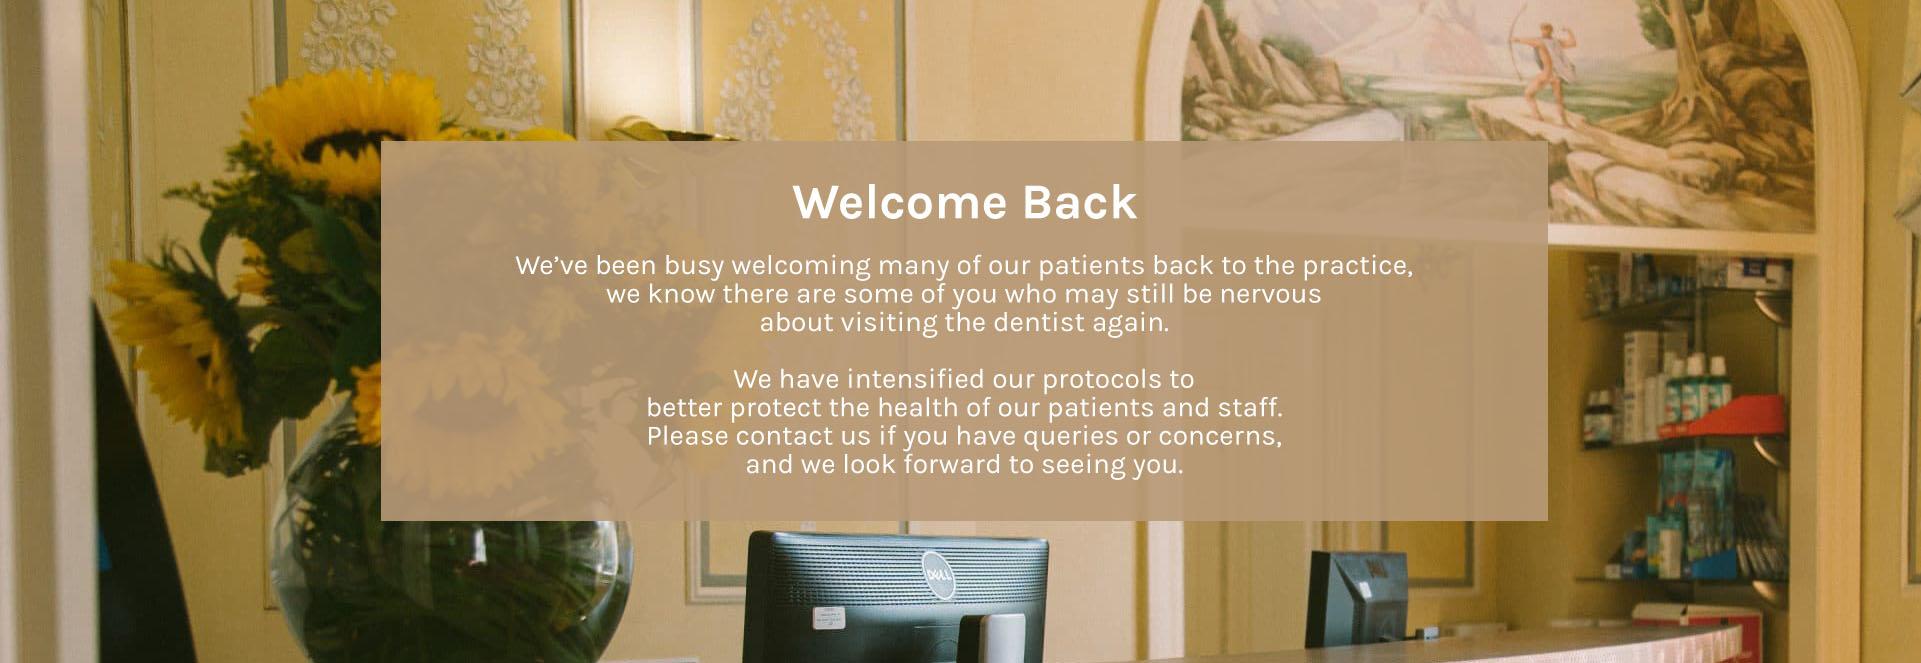 Windsor Centre for Advanced Dentistry